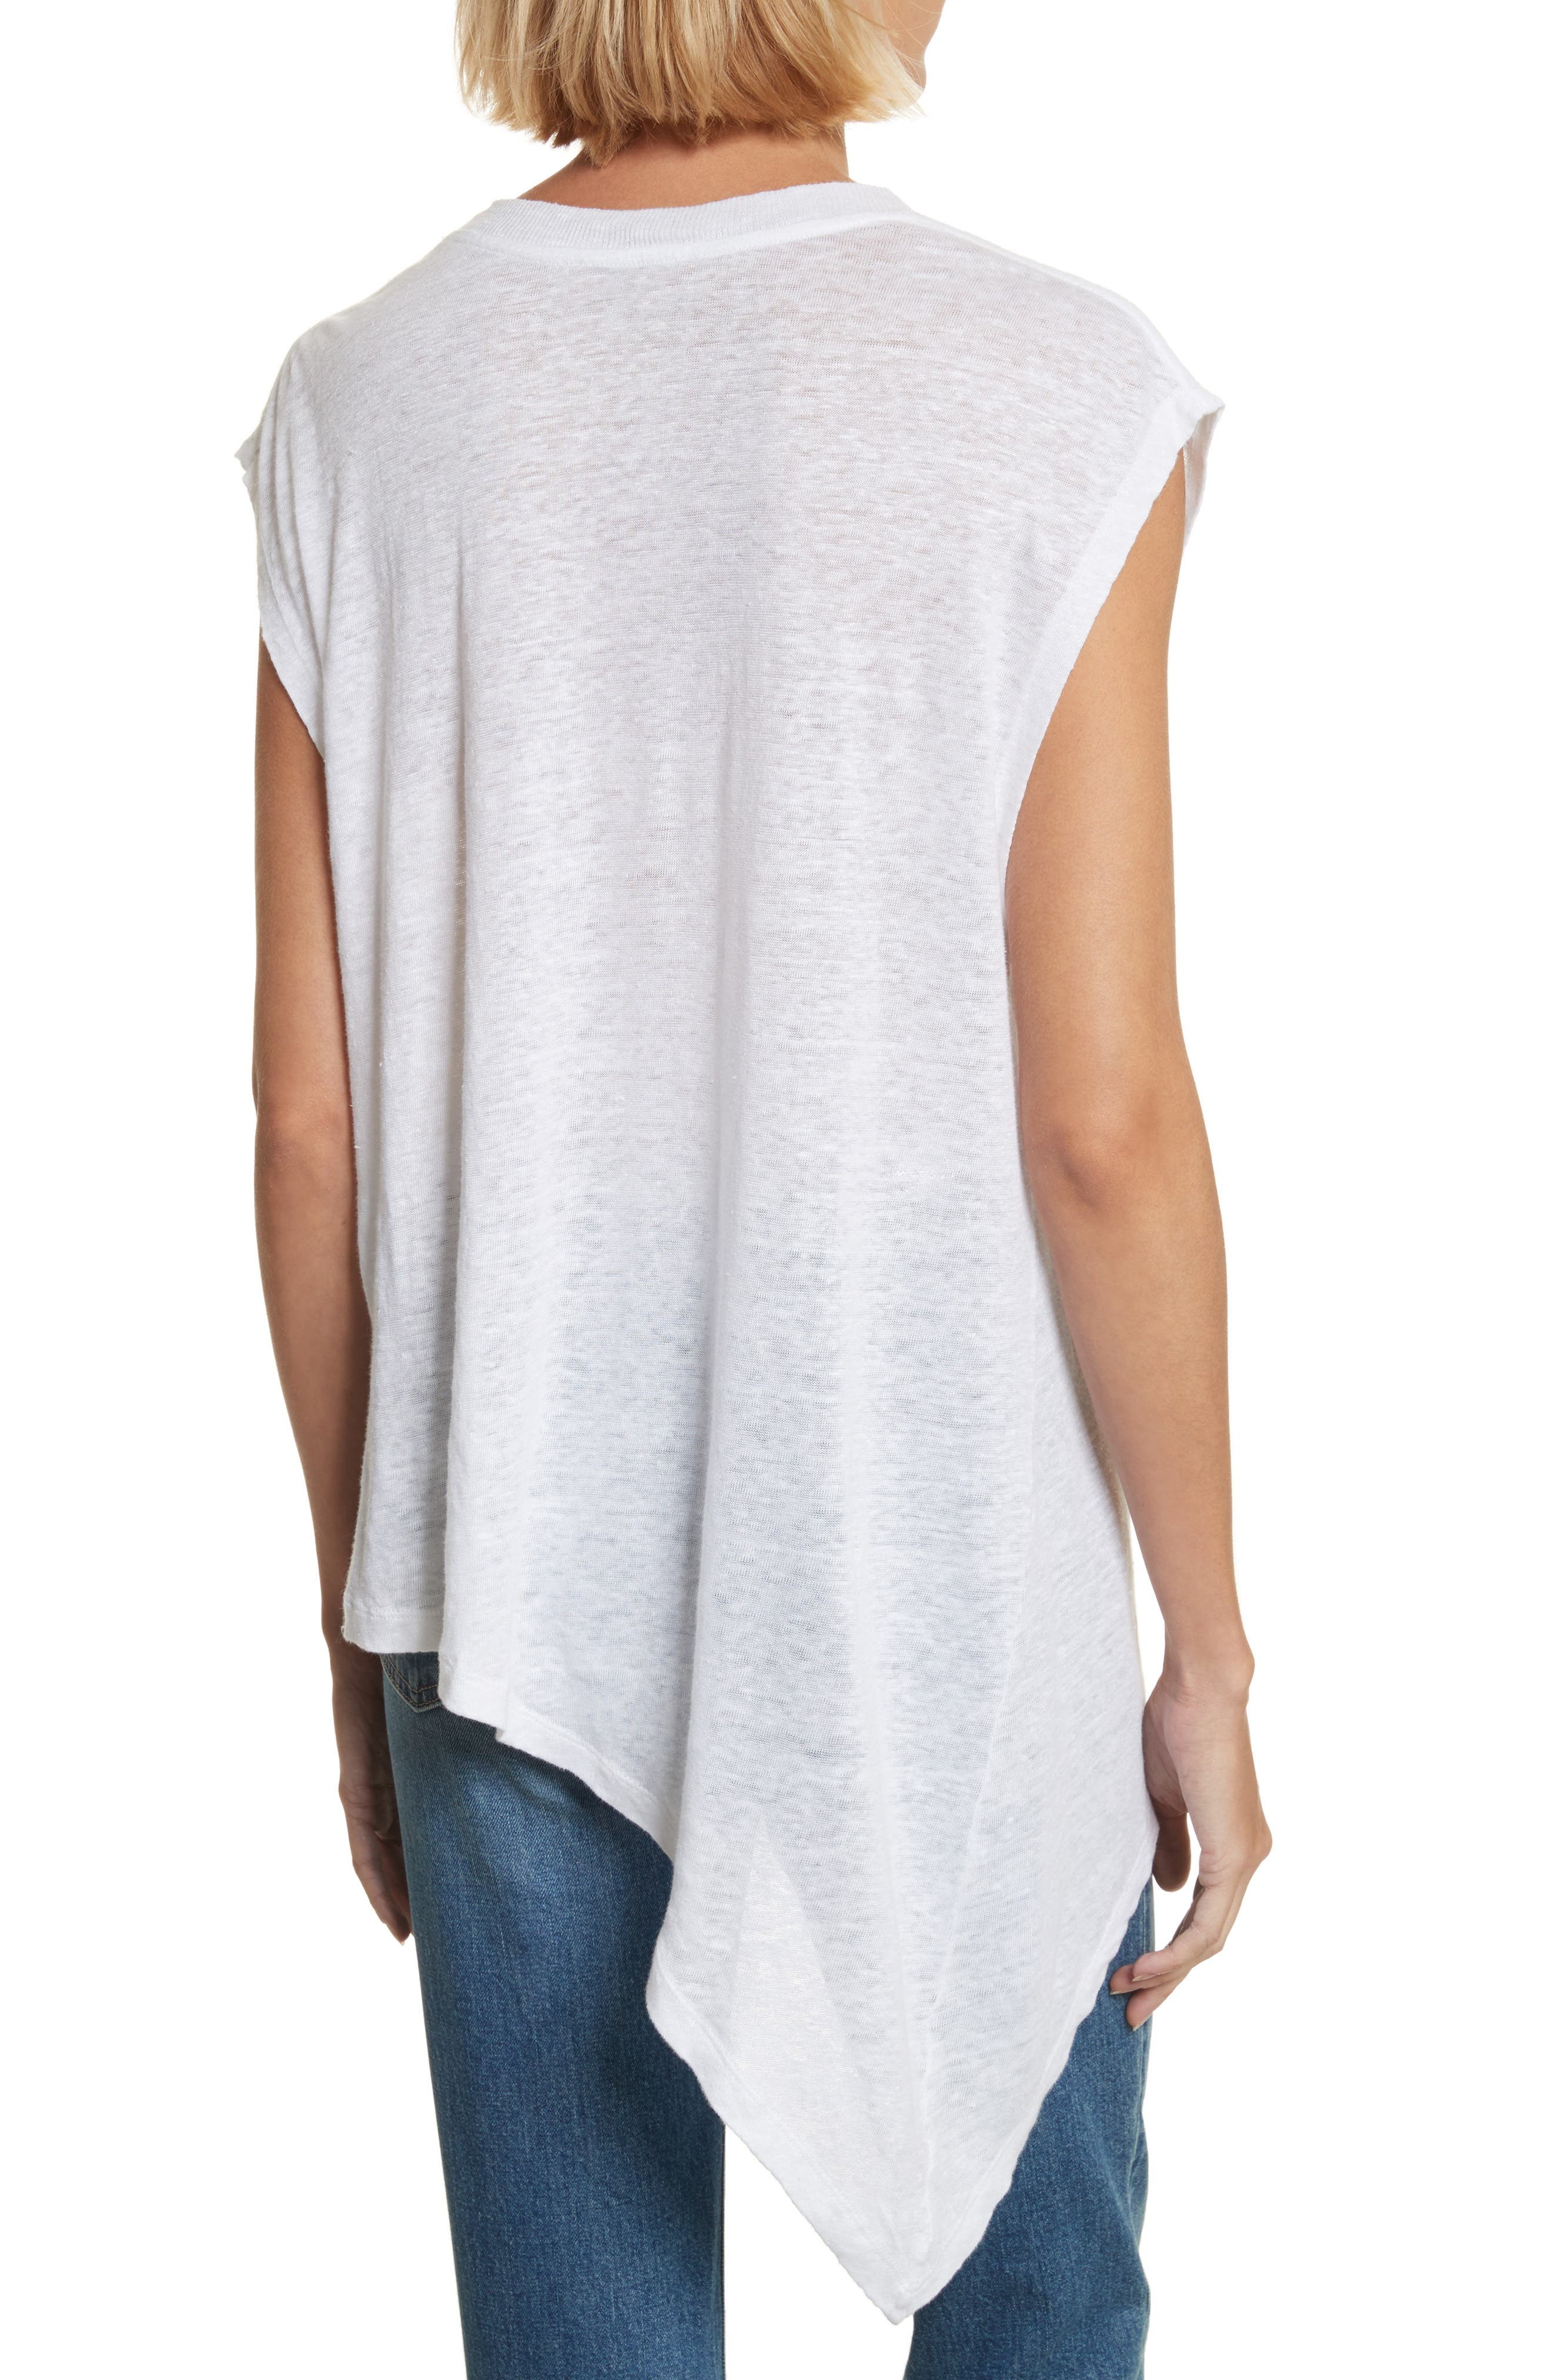 Karami Linen Asymmetrical Lace-Up Top,                             Alternate thumbnail 2, color,                             White